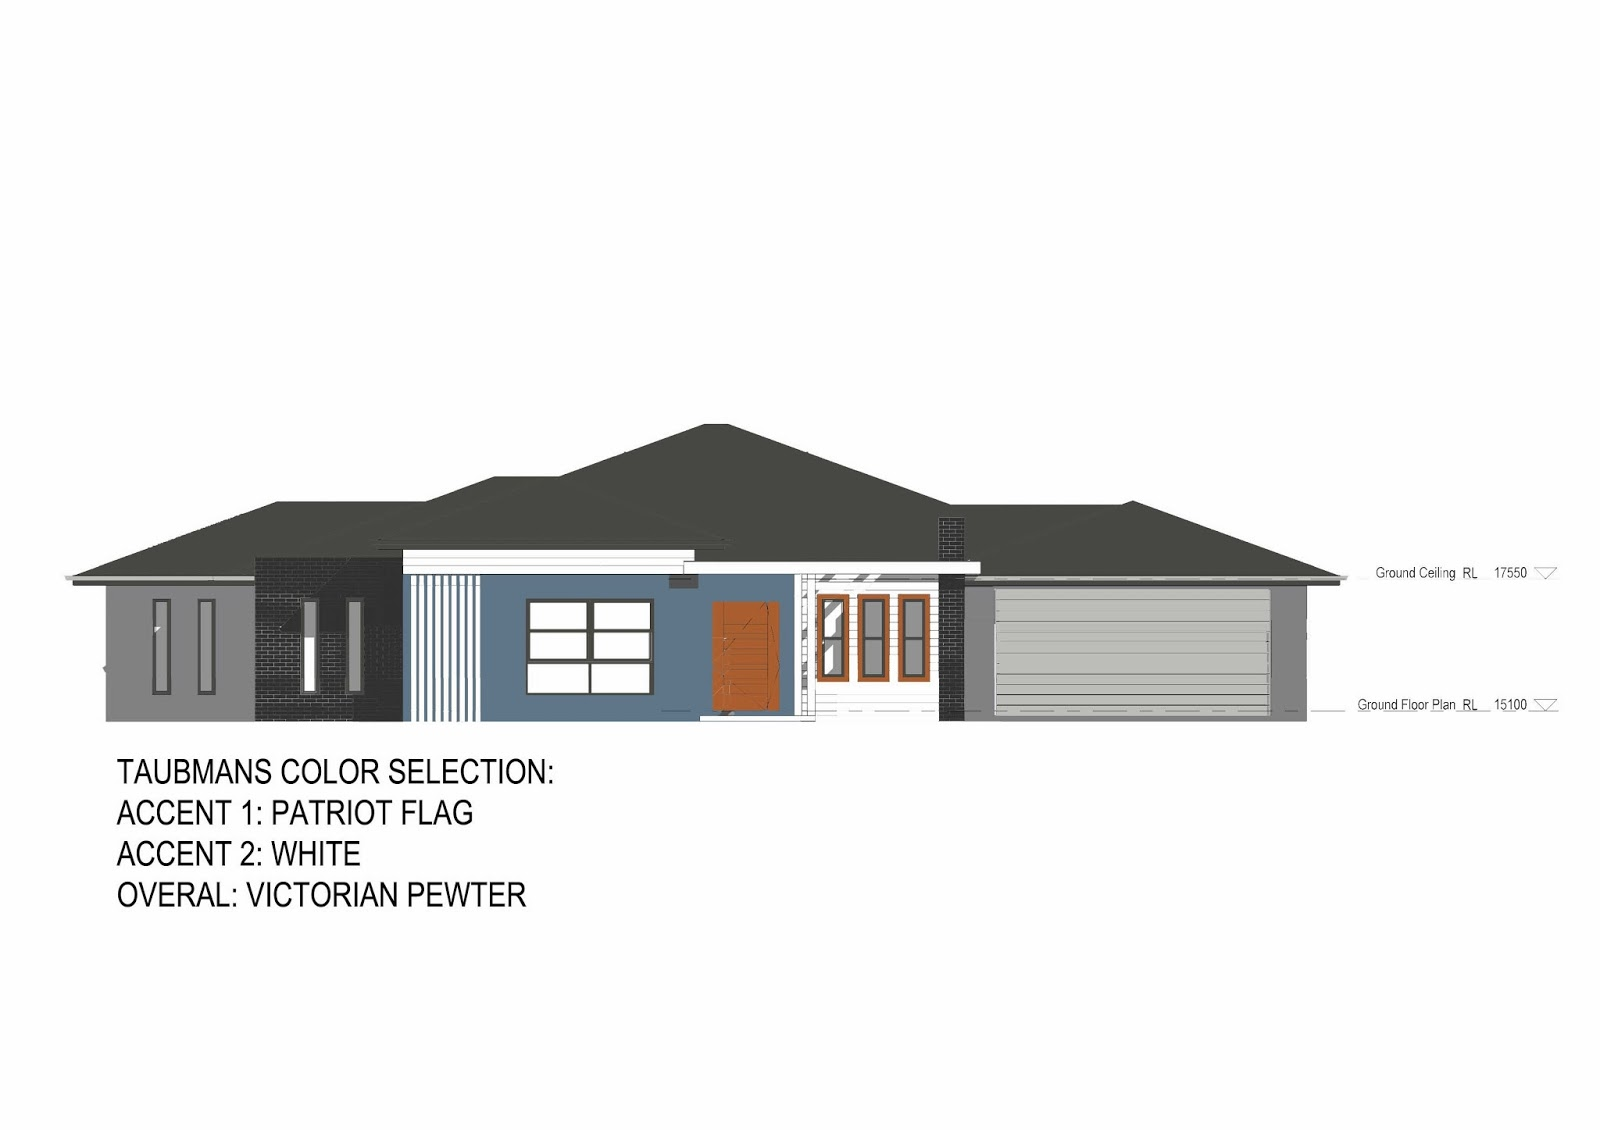 Modern Home Paint Ideas Exterior Frieze - Home Decorating ...